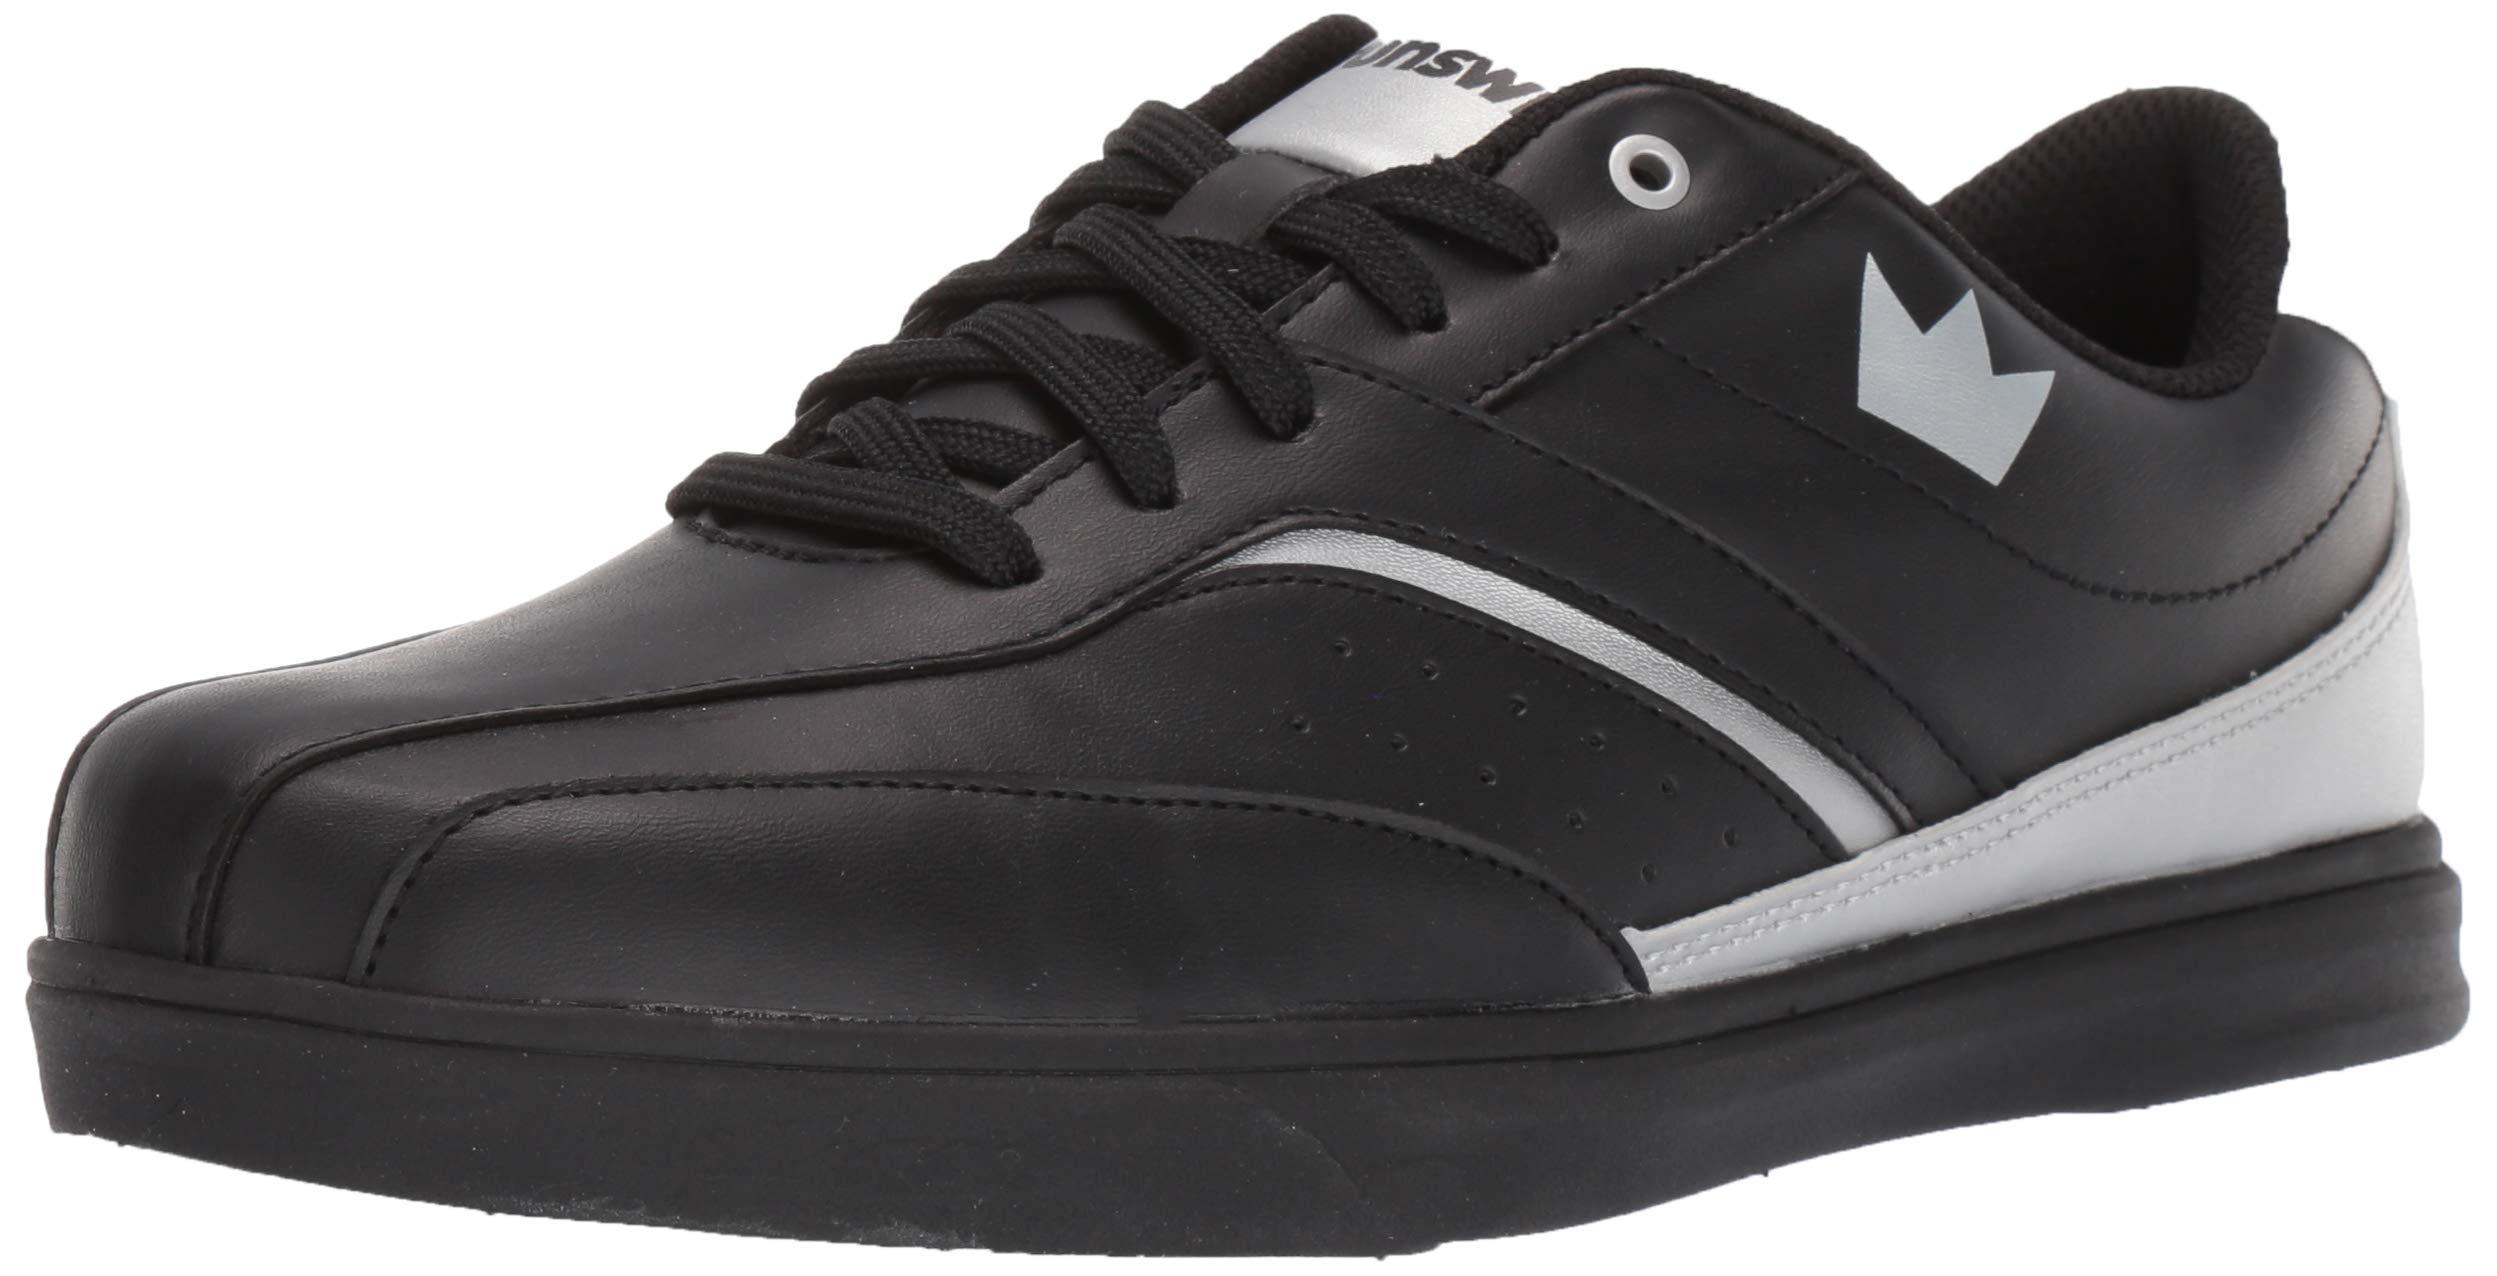 Brunswick Vapor Mens Bowling Shoe Black/Silver, 7.0